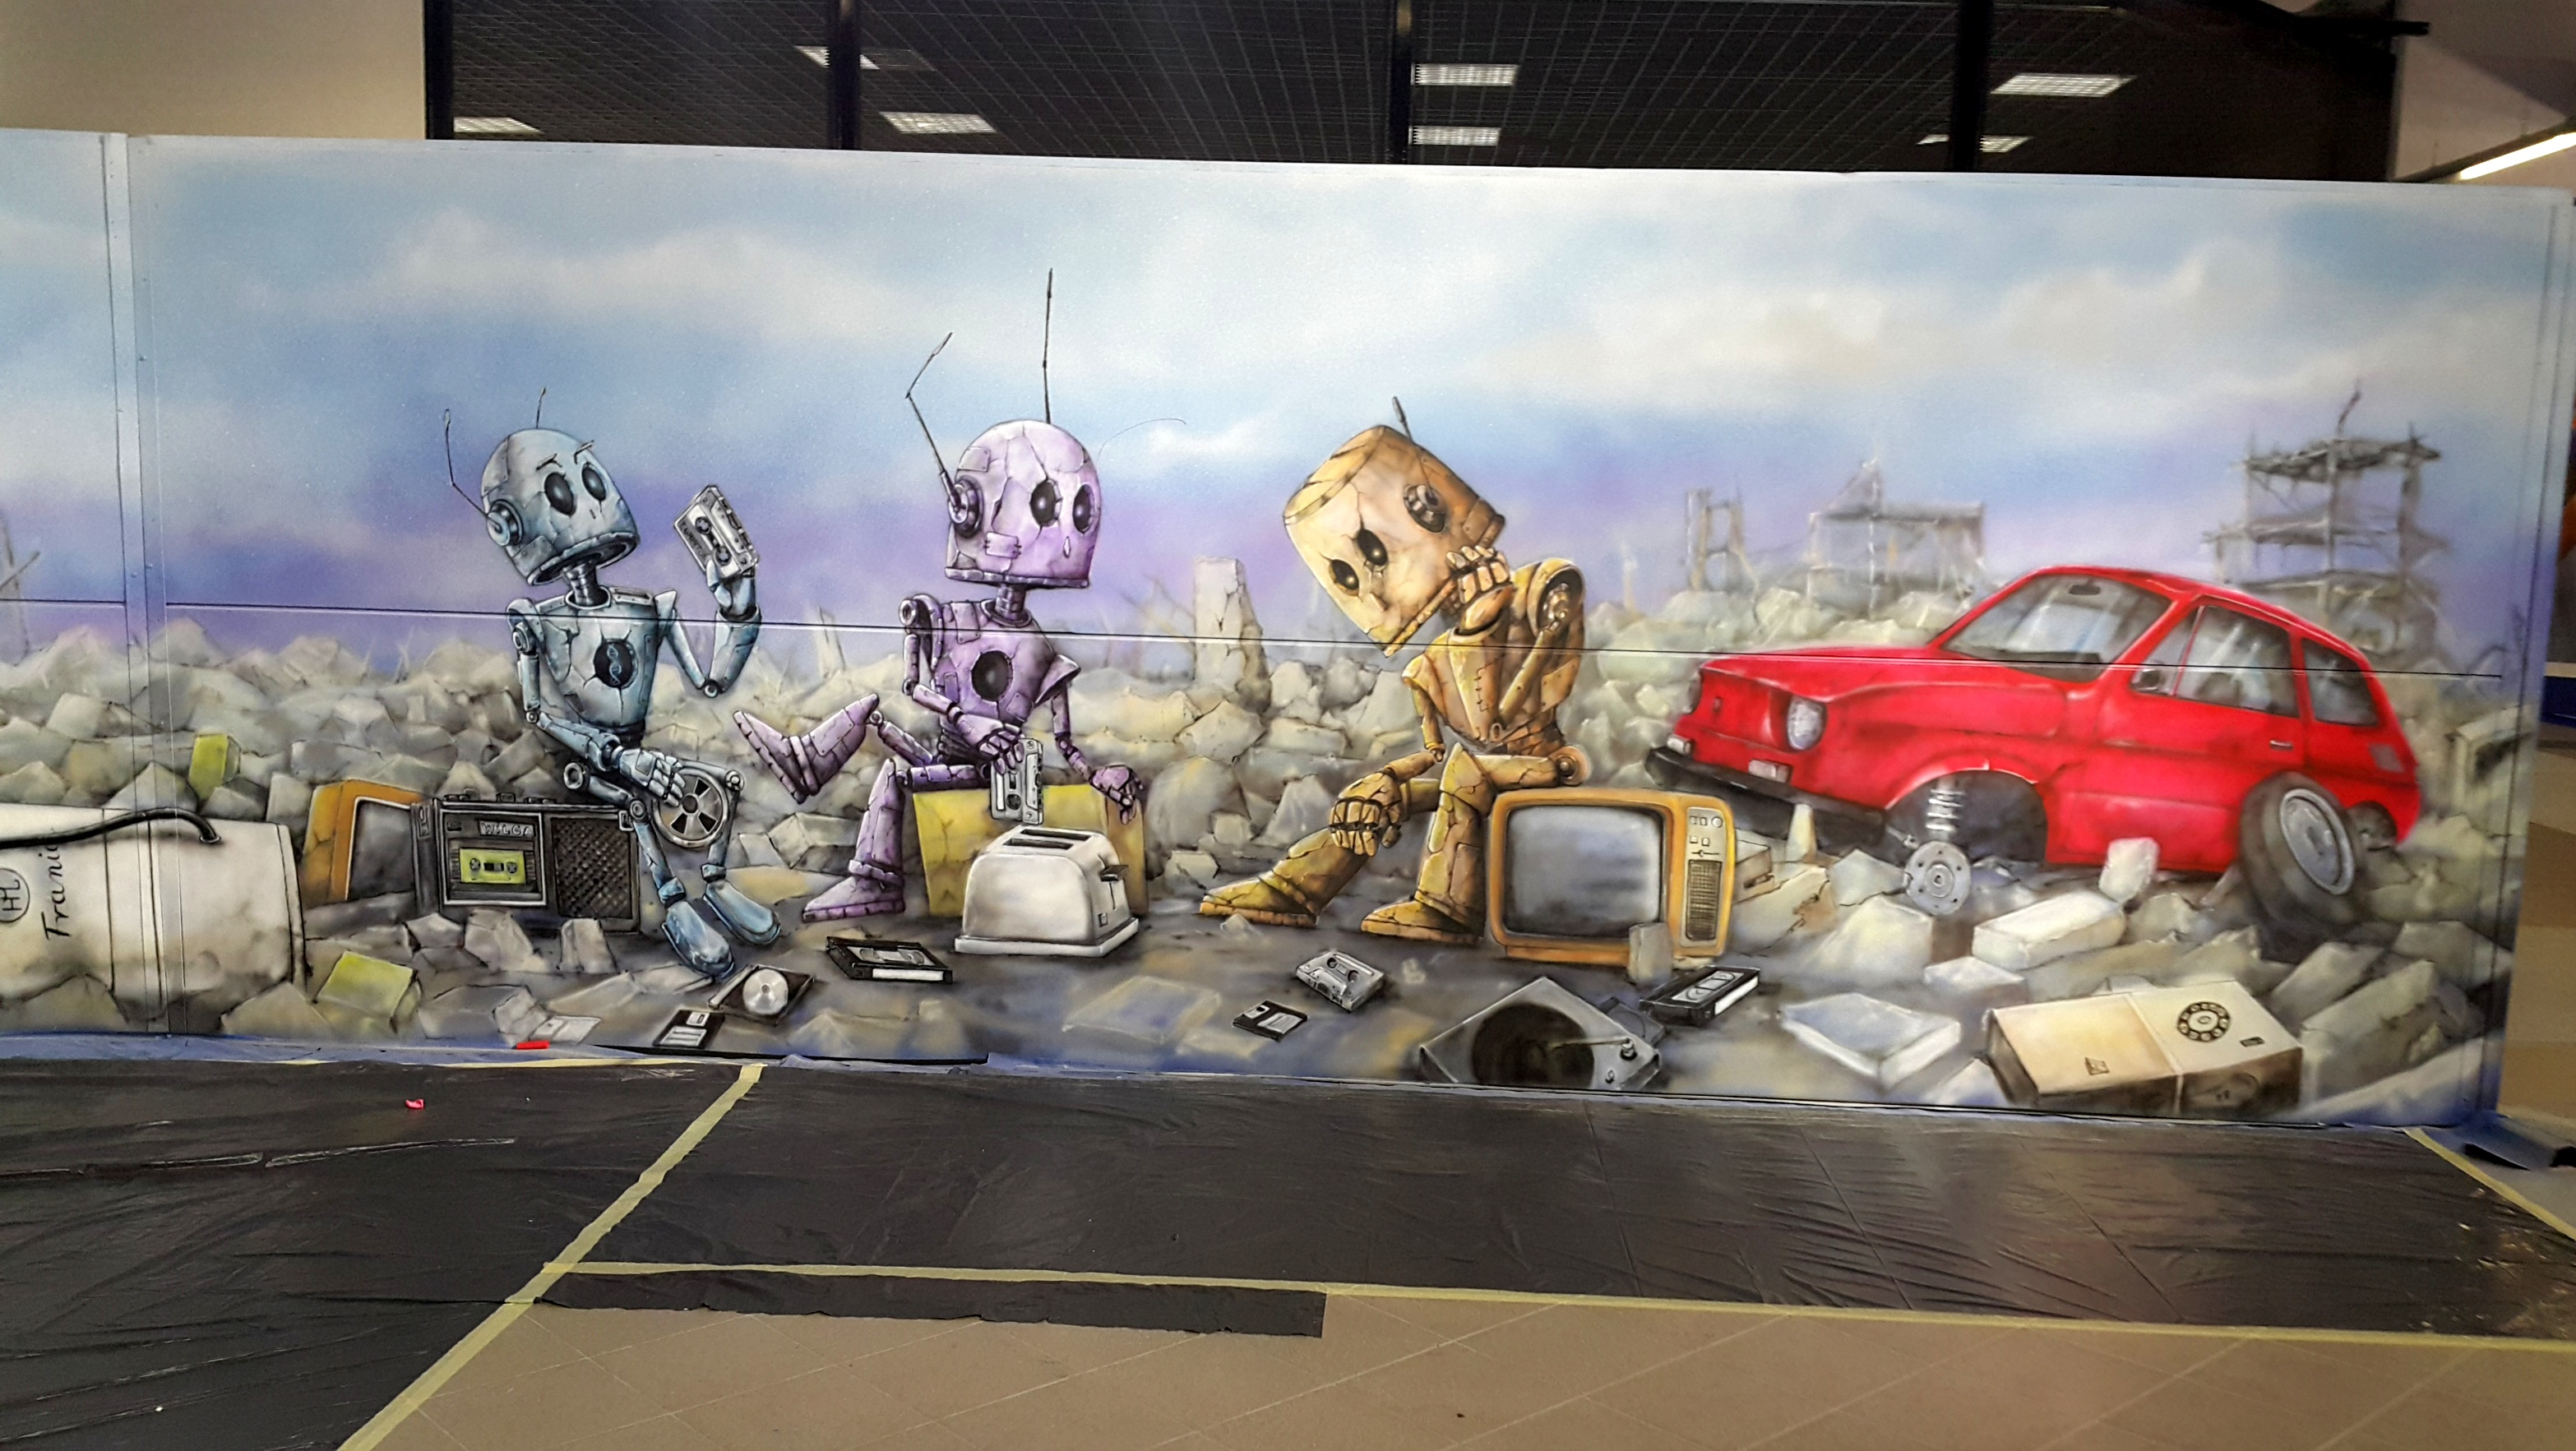 Mural Tasmowe nośniki pamieci, ariel kula, Comic Con